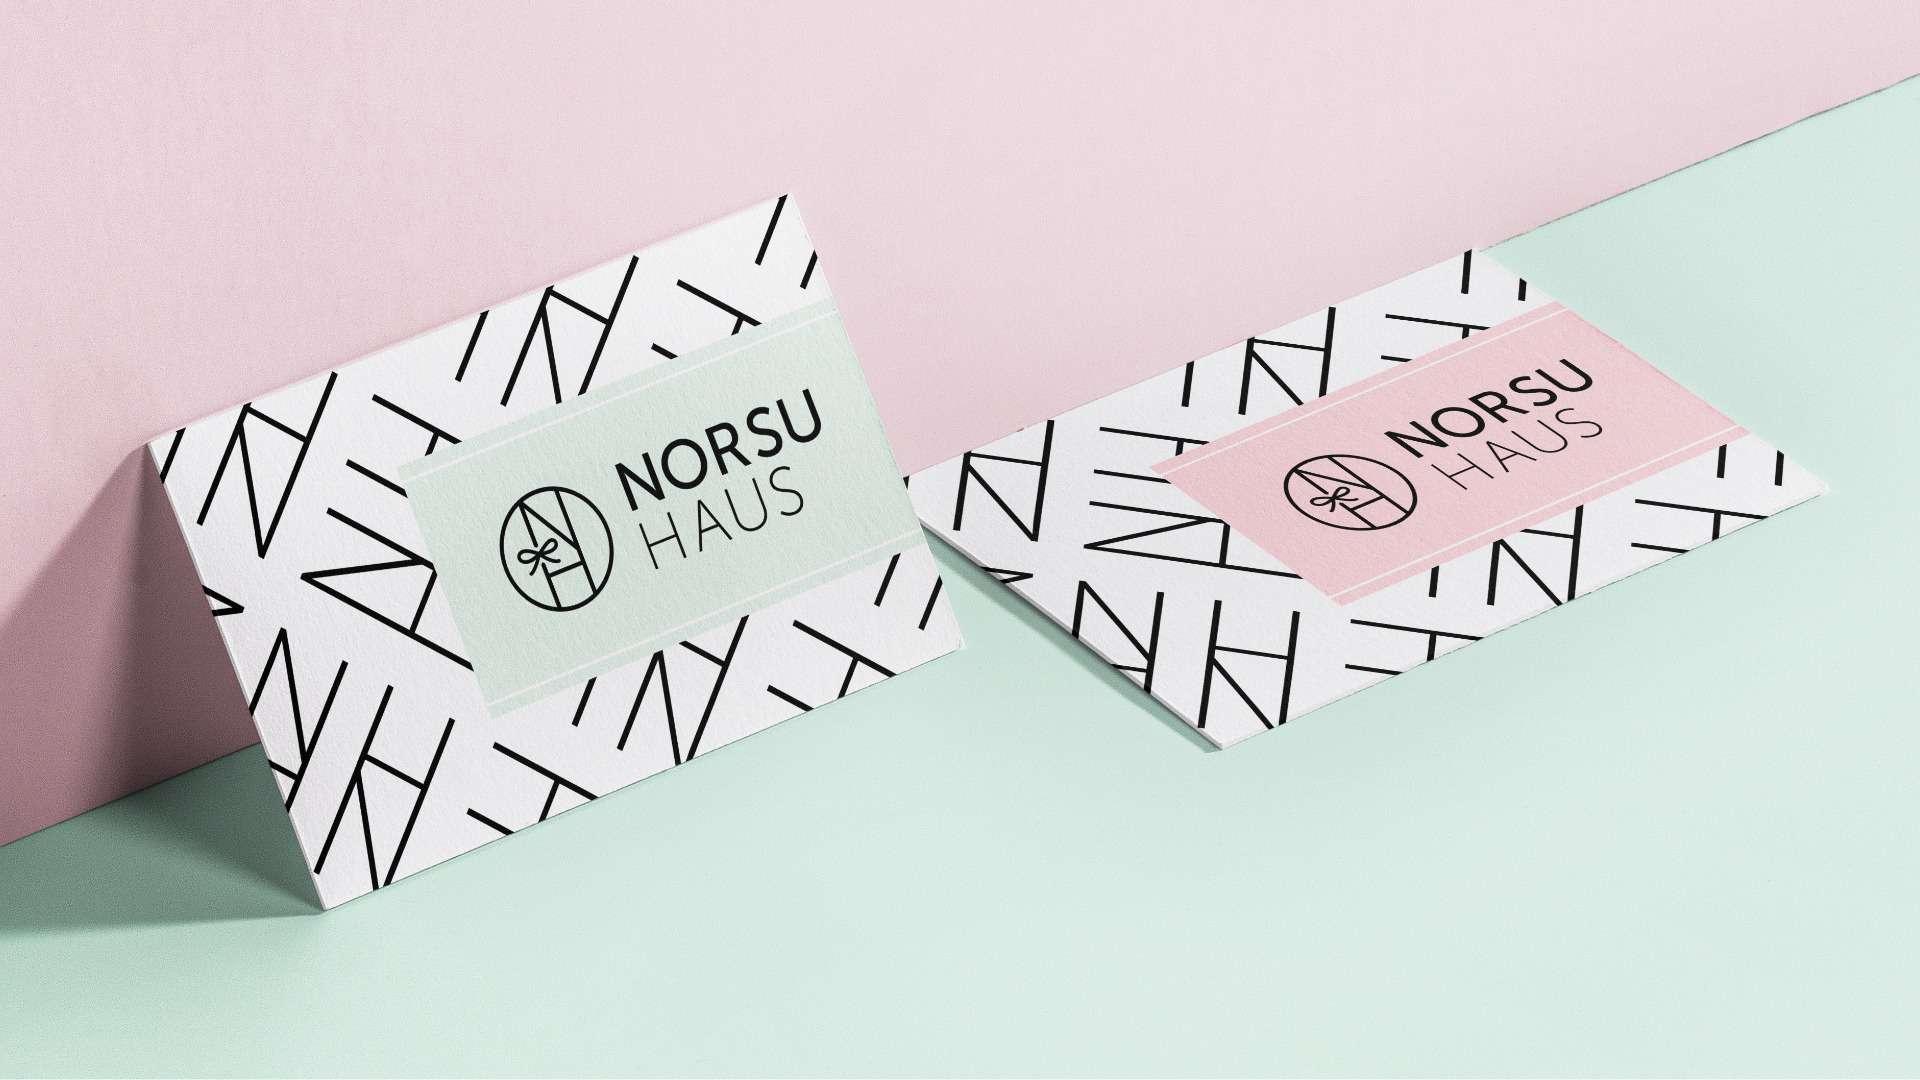 Norsu Haus Paper Design - Creative Design - Citizen Best